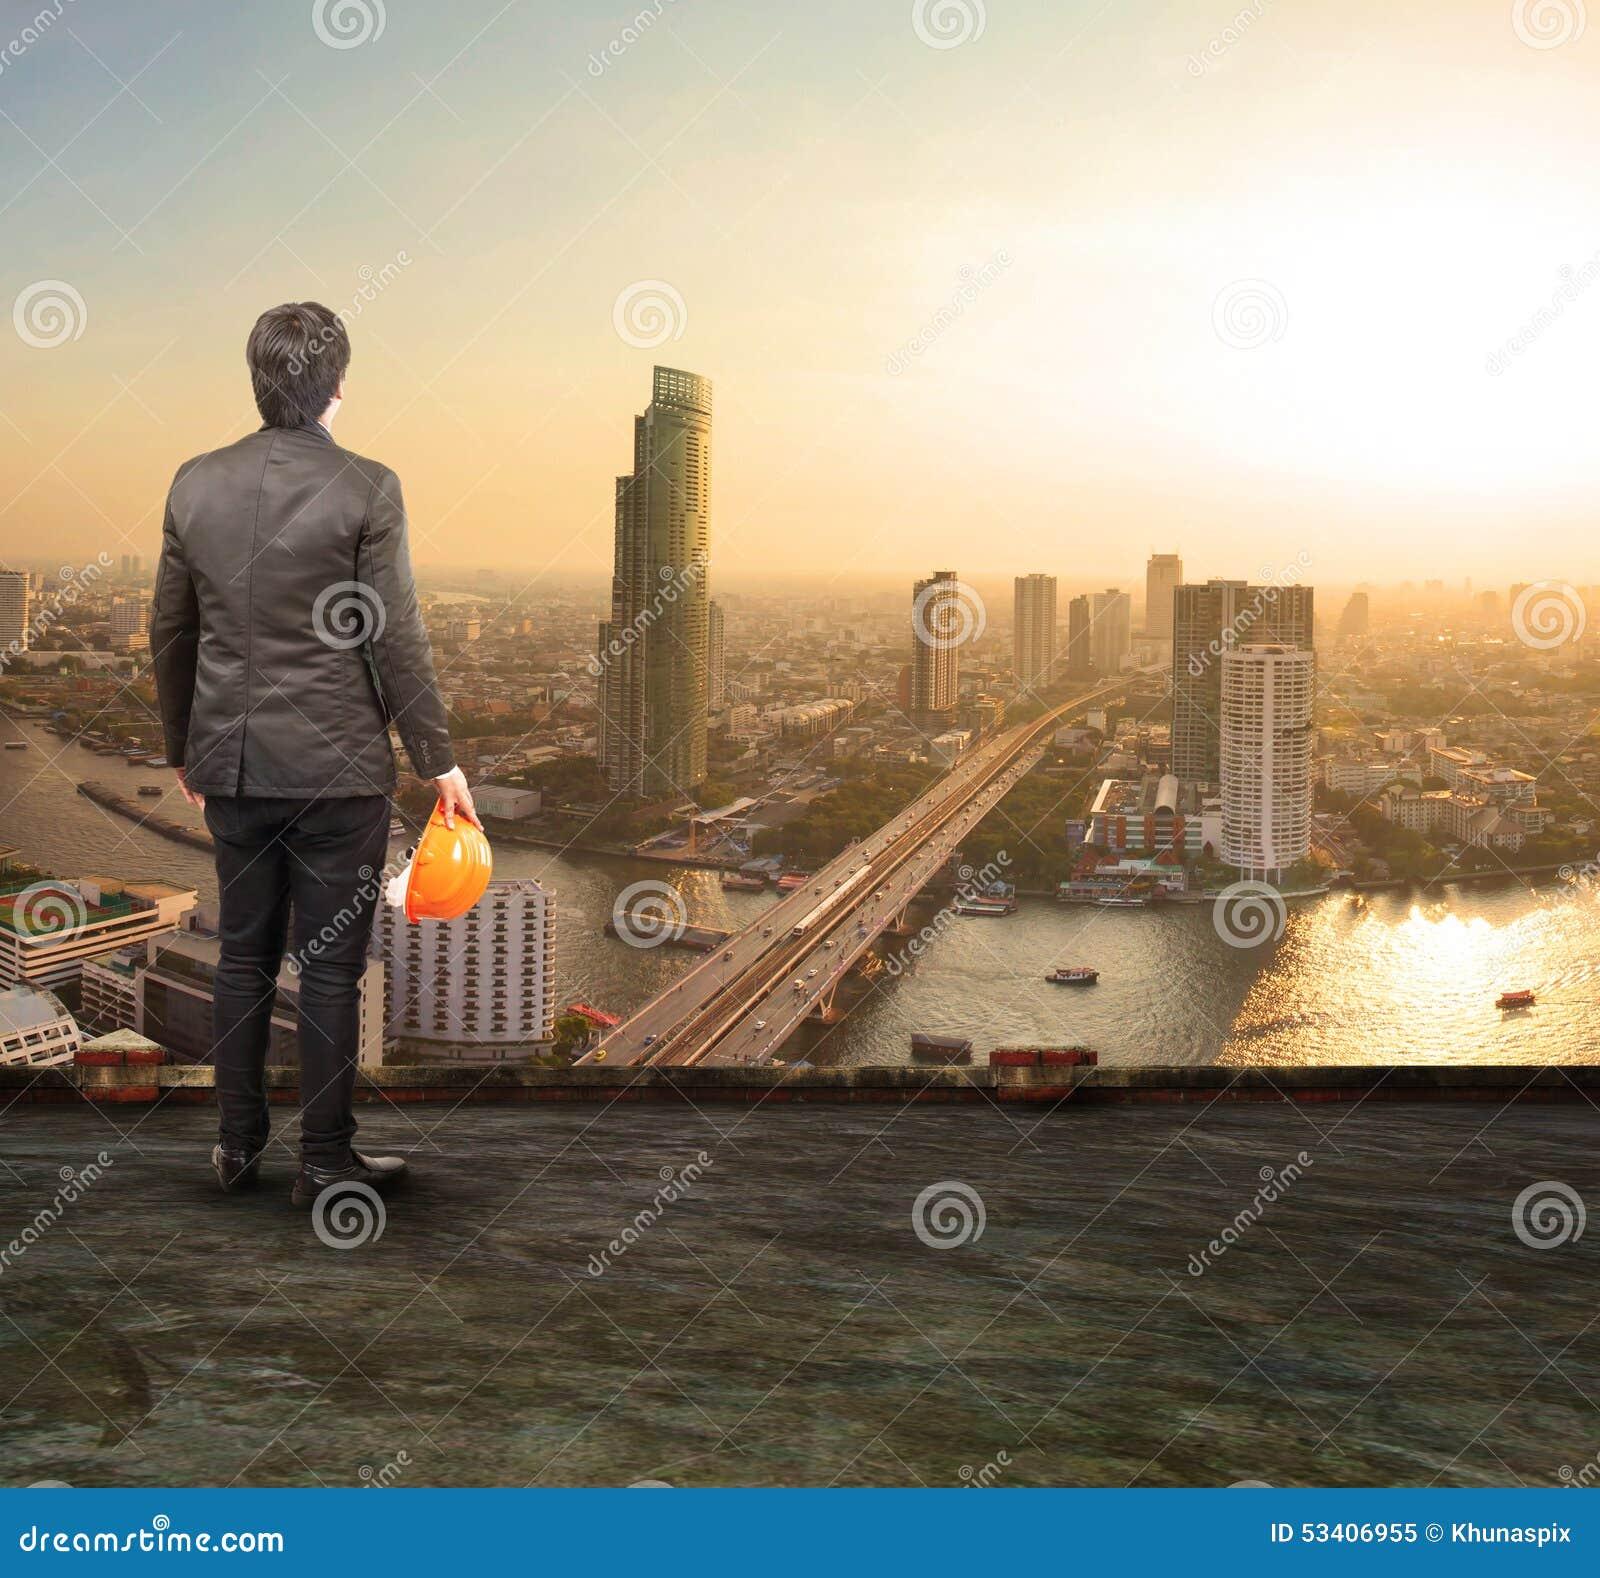 Engineering Man Standing On Top Of Building Looking To